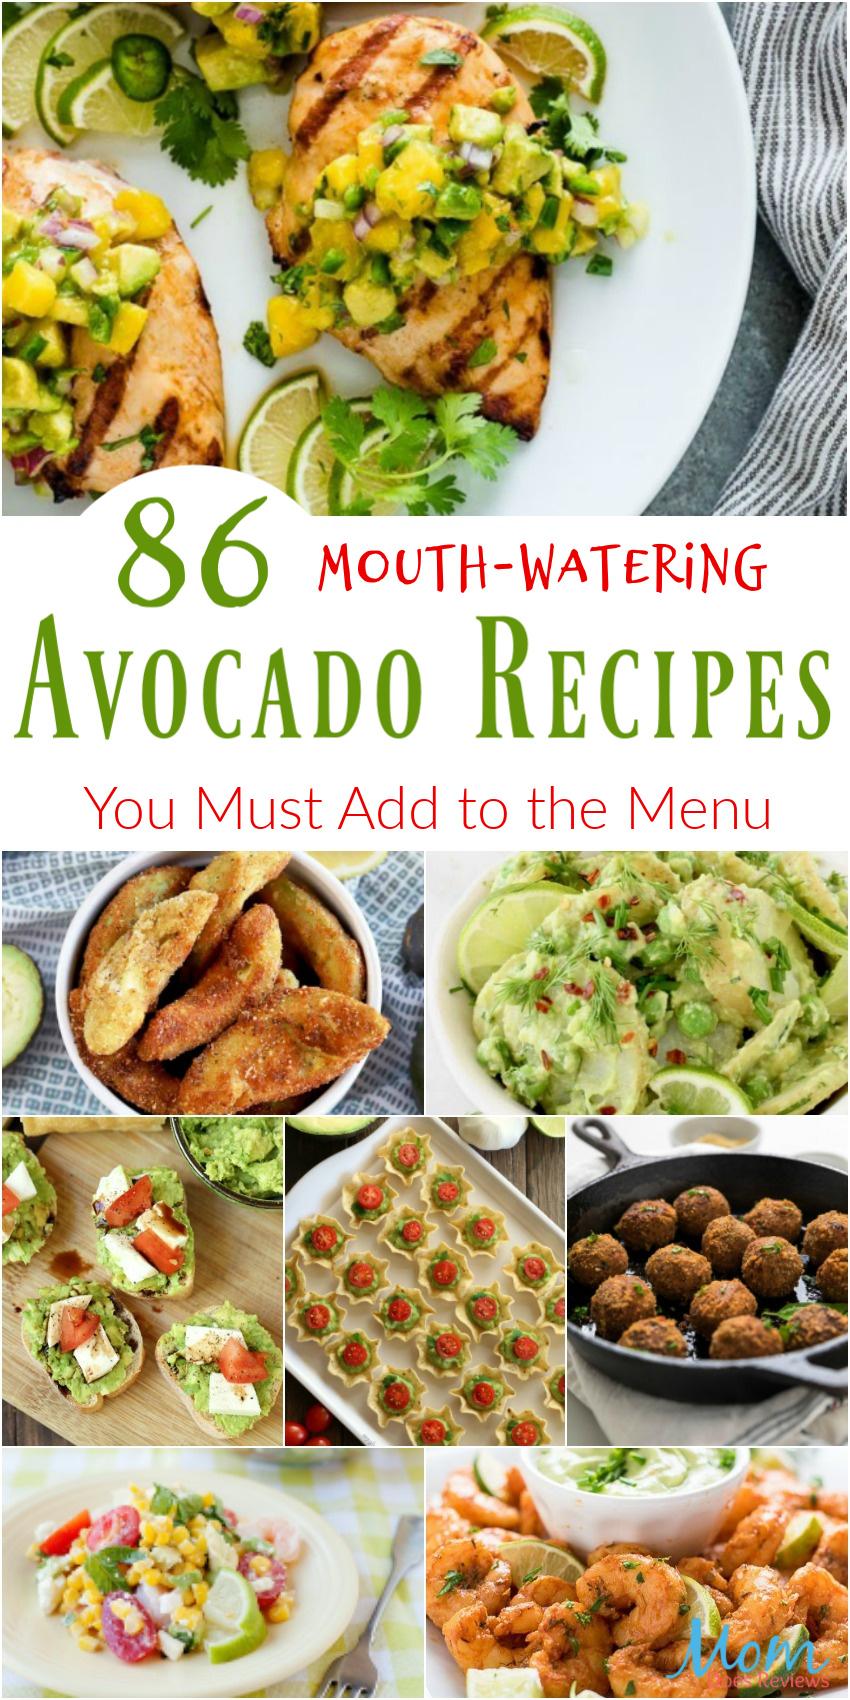 86 Delicious Avocado Recipes You Must Add to the Menu #avocado #recipes #food #foodie #getinmybelly